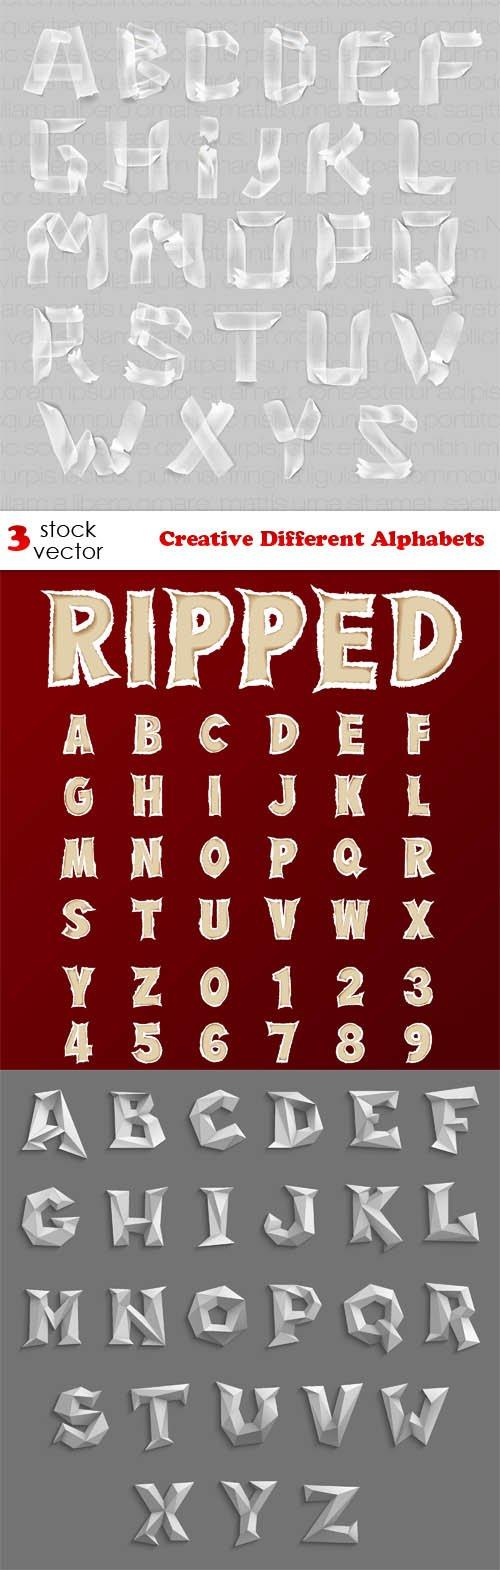 Vectors - Creative Different Alphabets